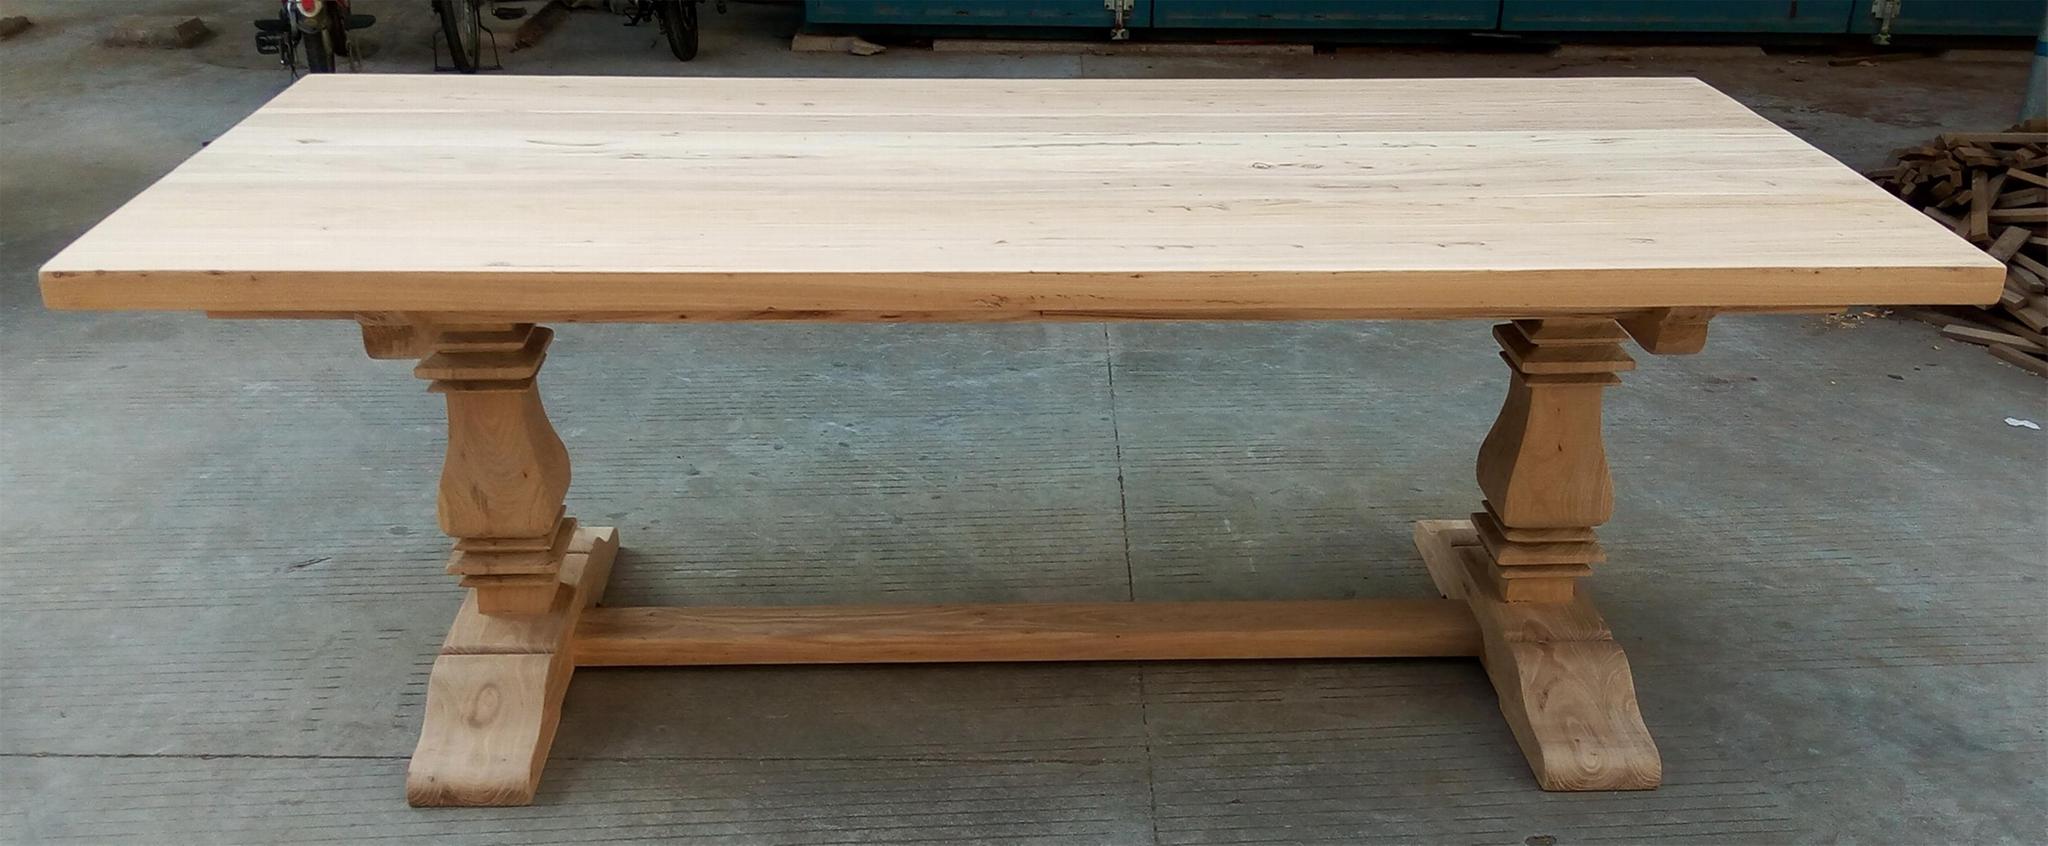 extendable elmwood dining table